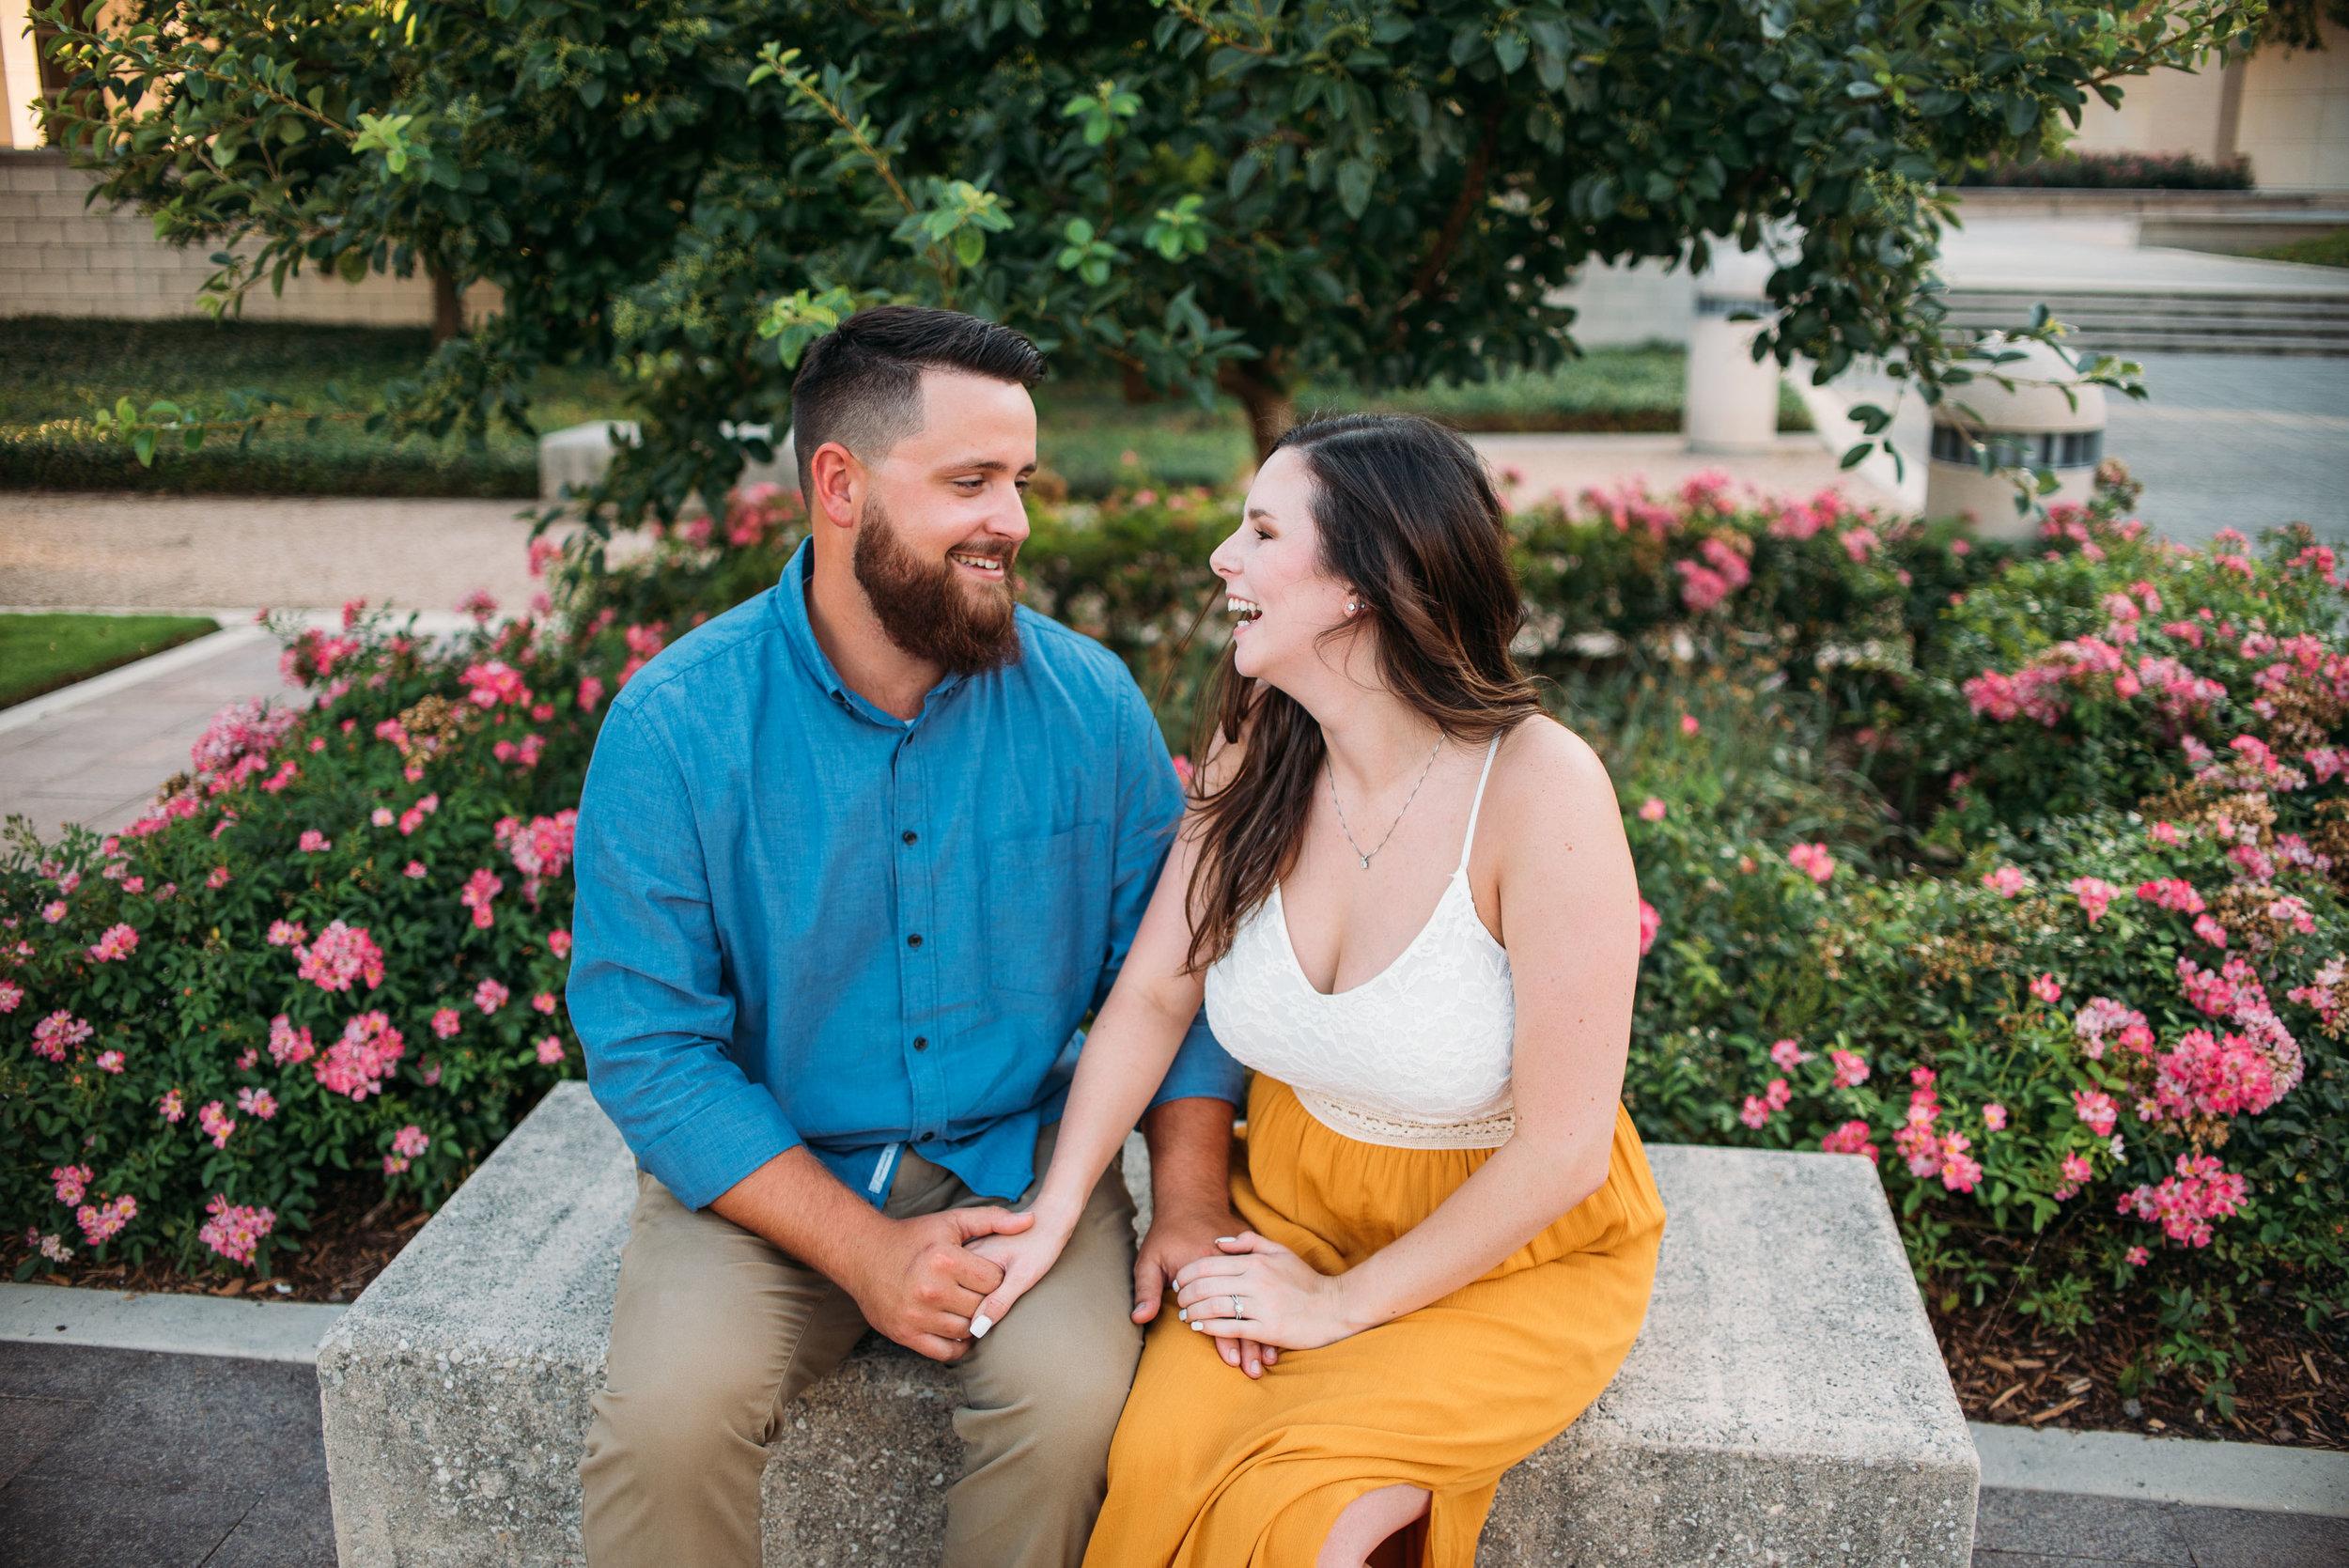 George-Bush-Library-Texas-A&M-University-Engagement-College-Station-Wedding-Photographer-San-Angel-Photo-Mark-Jenna-Matt-Century-Tree-13.jpg